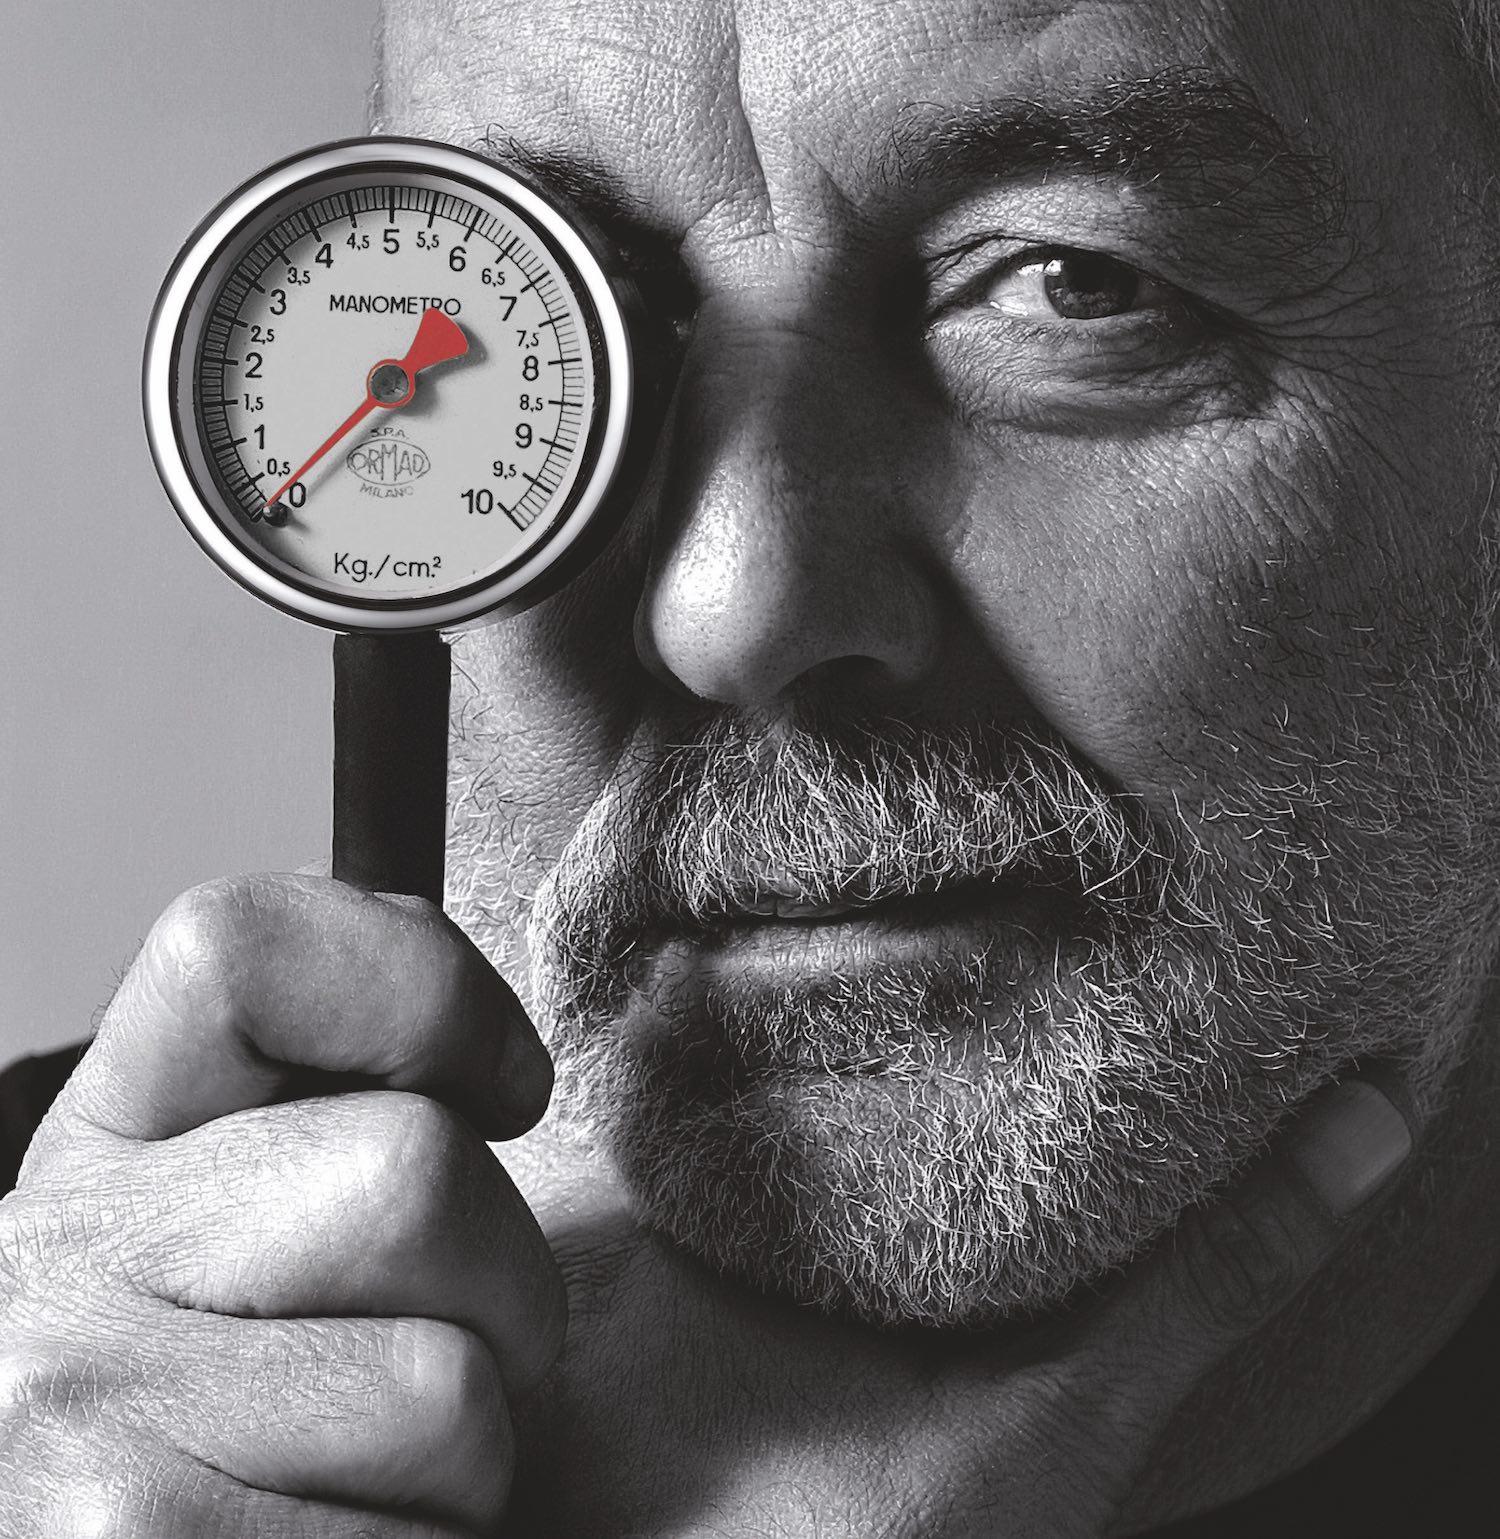 Giuliano Mazzuoli watches